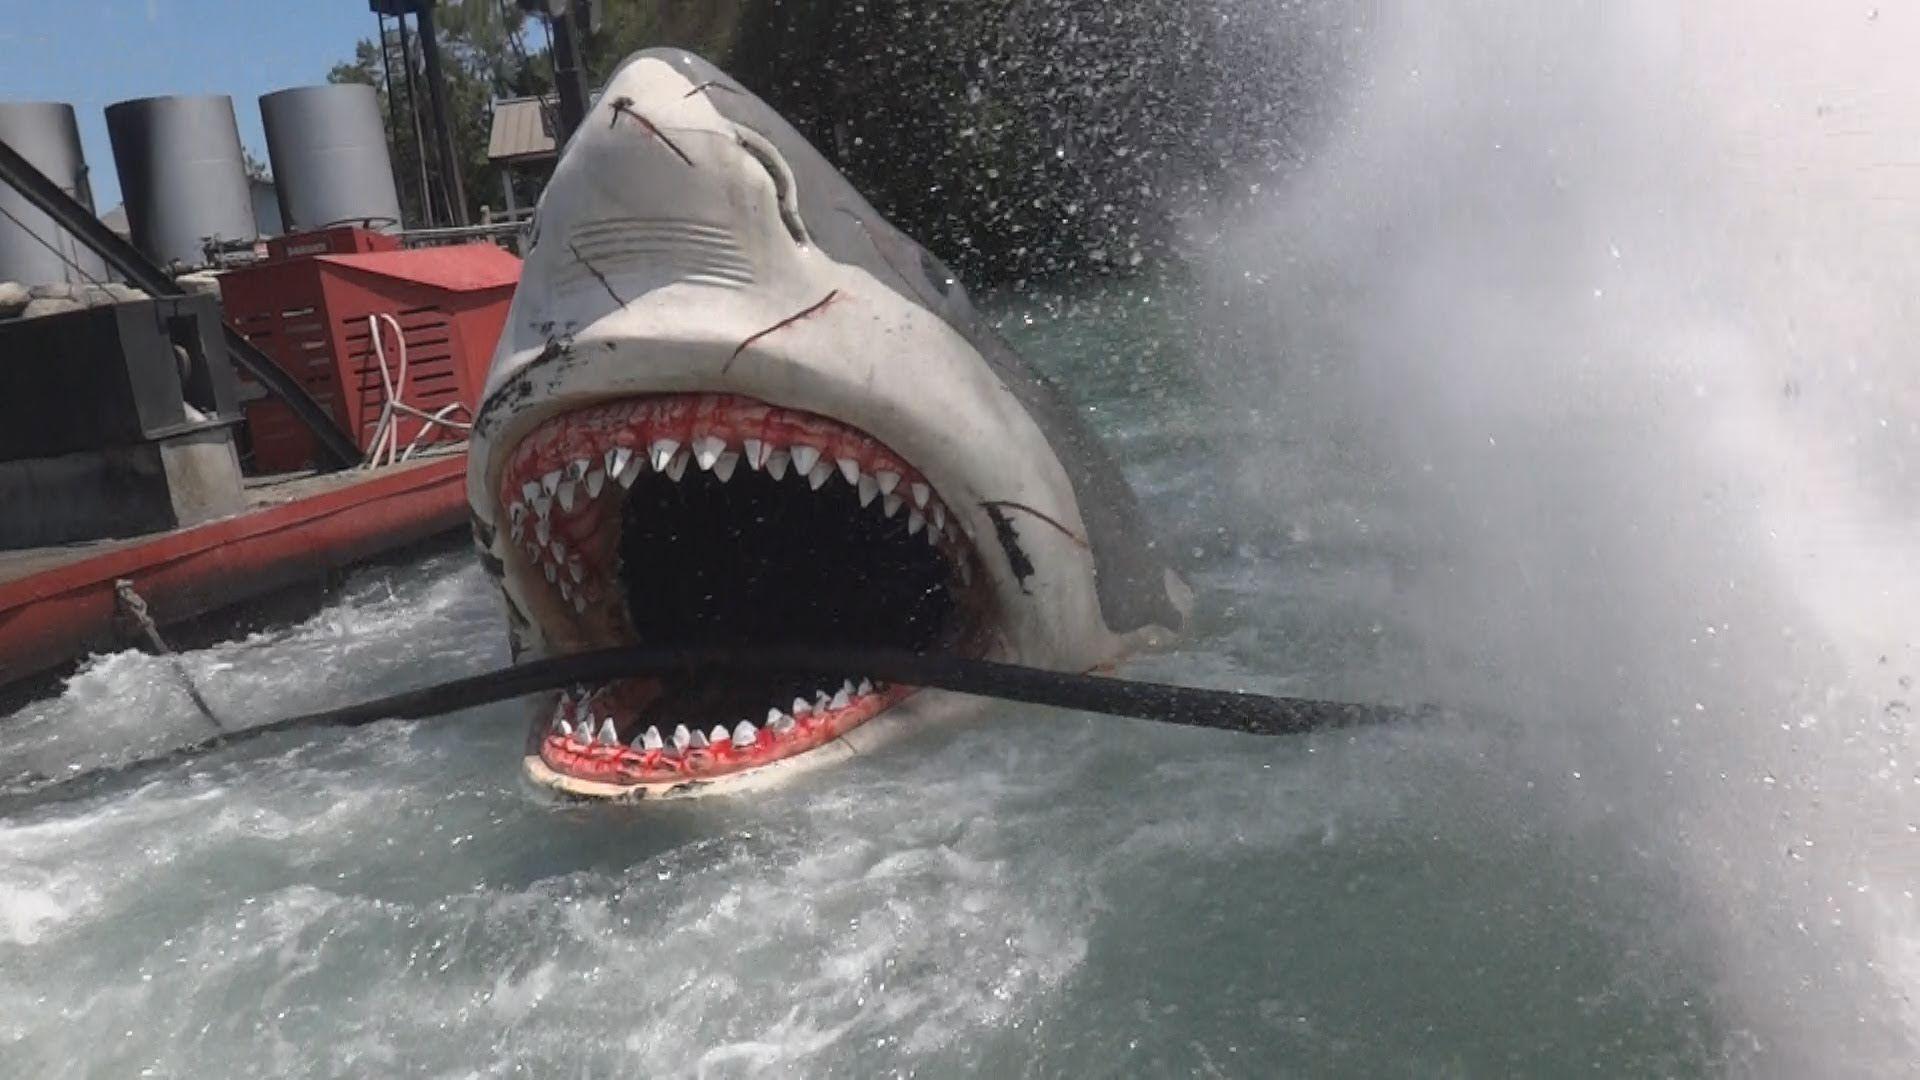 Jaws ride Universal